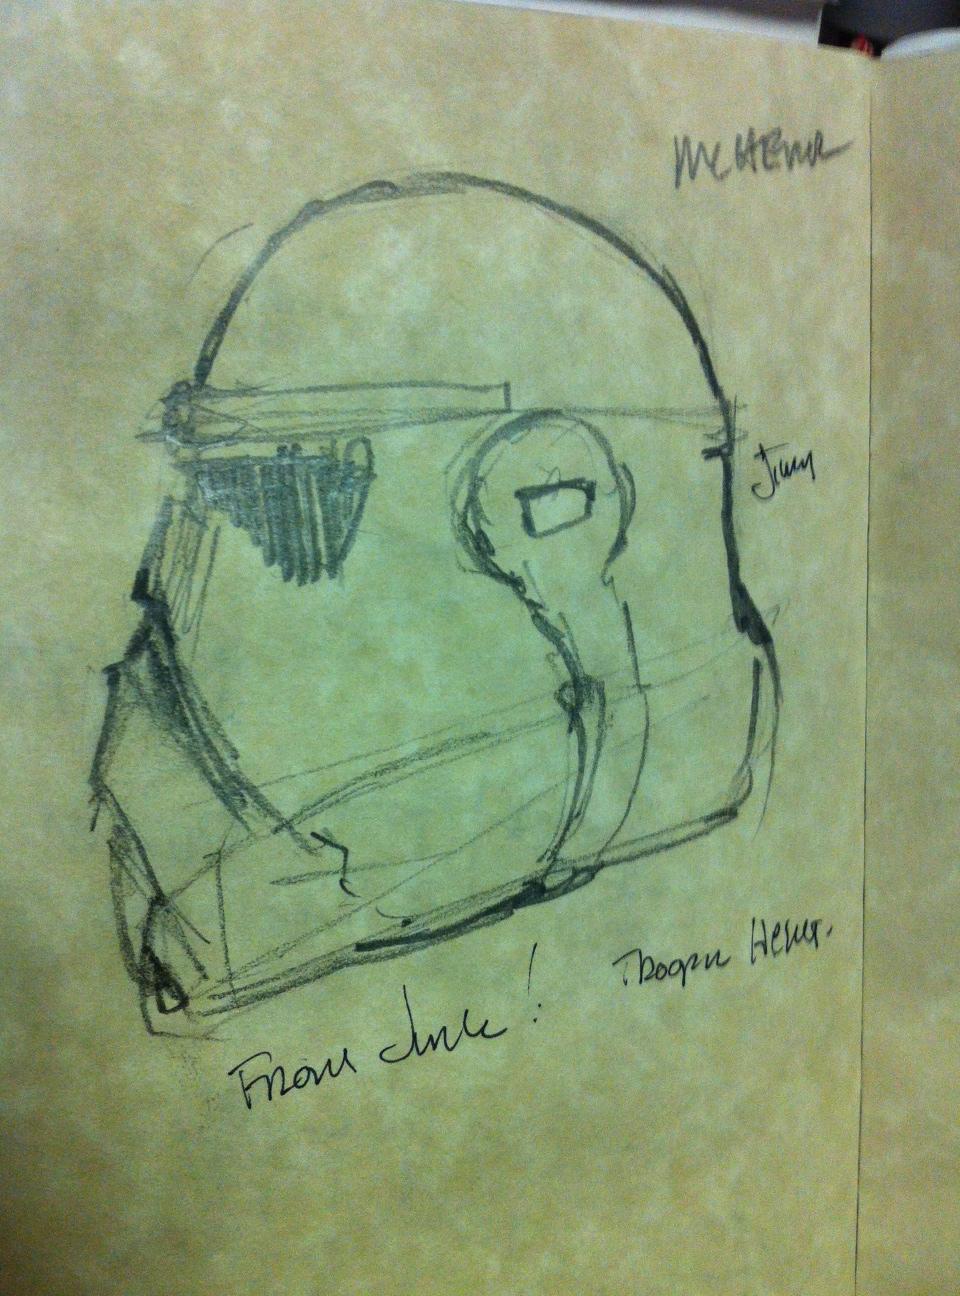 DiResta: Jimmy Carves a Stormtrooper Helmet for Halloween